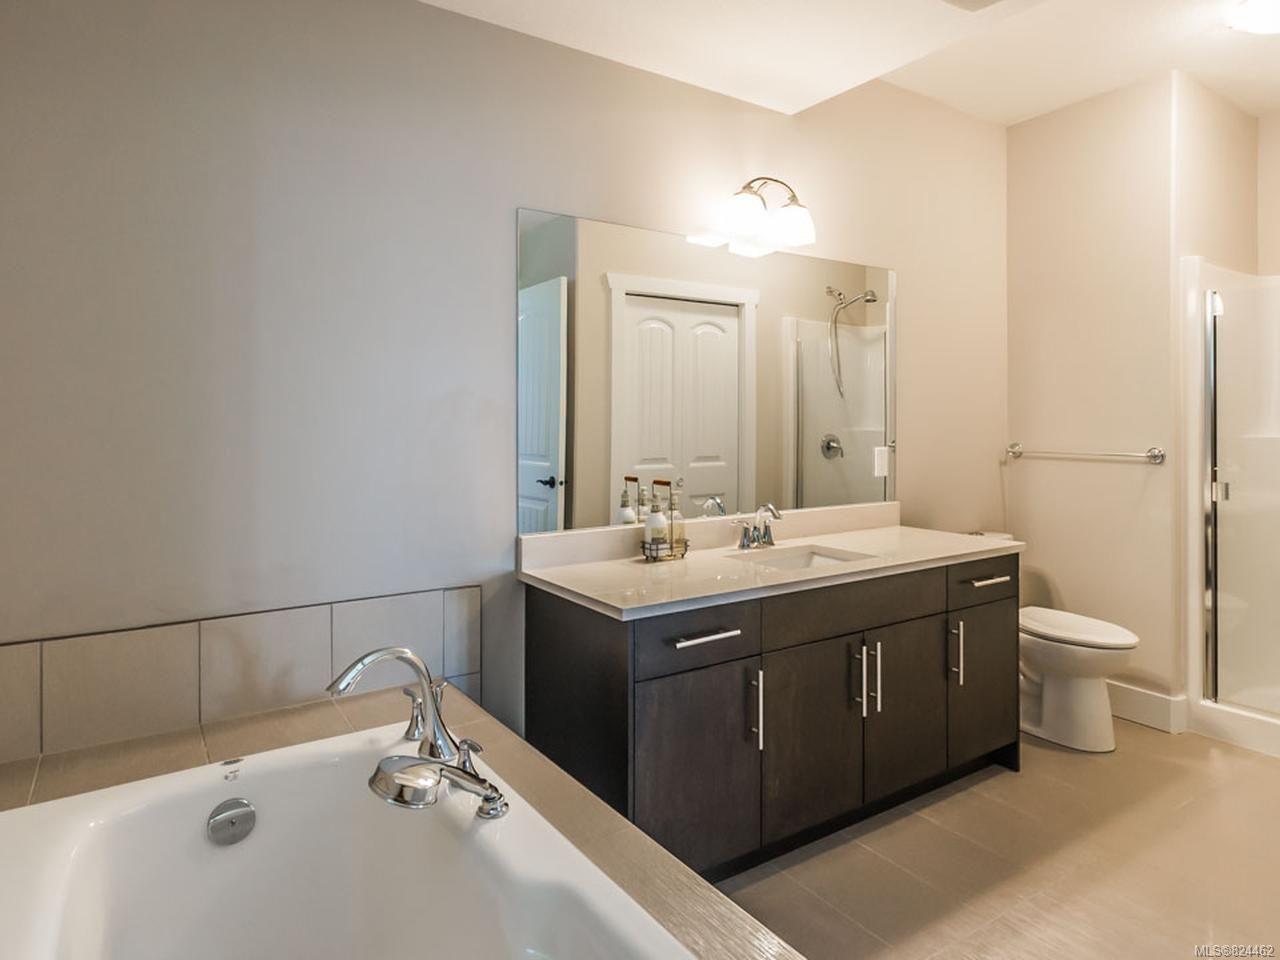 Photo 30: Photos: 3864 Gulfview Dr in NANAIMO: Na North Nanaimo House for sale (Nanaimo)  : MLS®# 824462